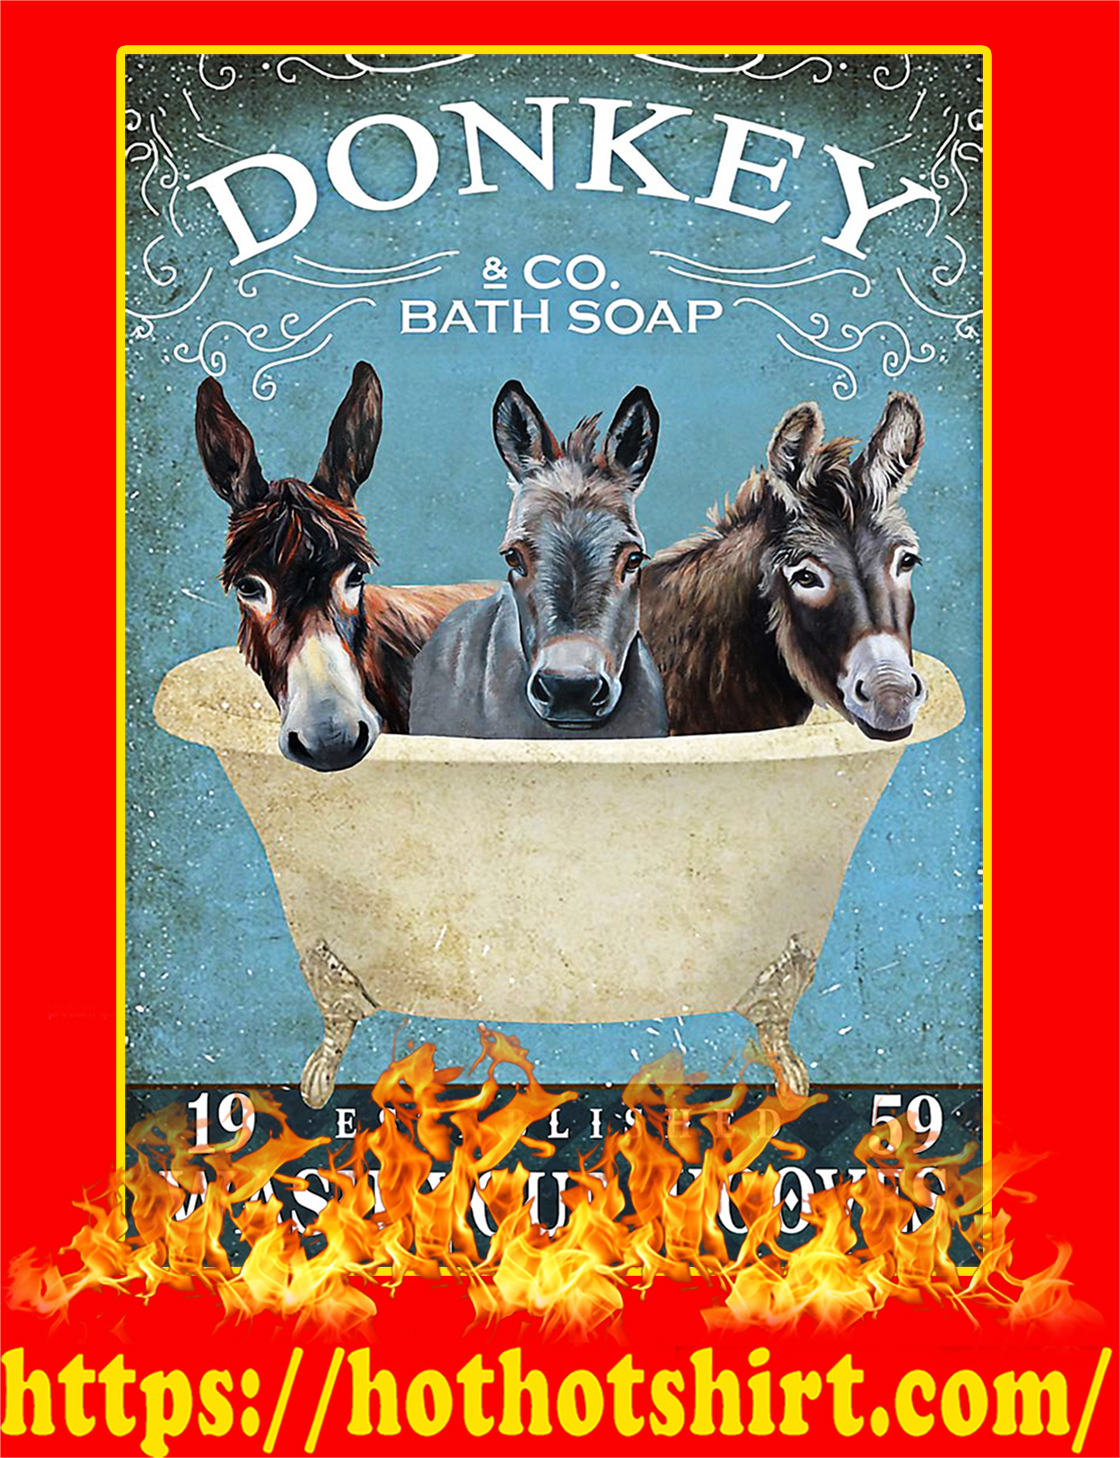 Donkey Company Bath Soap Poster - A2